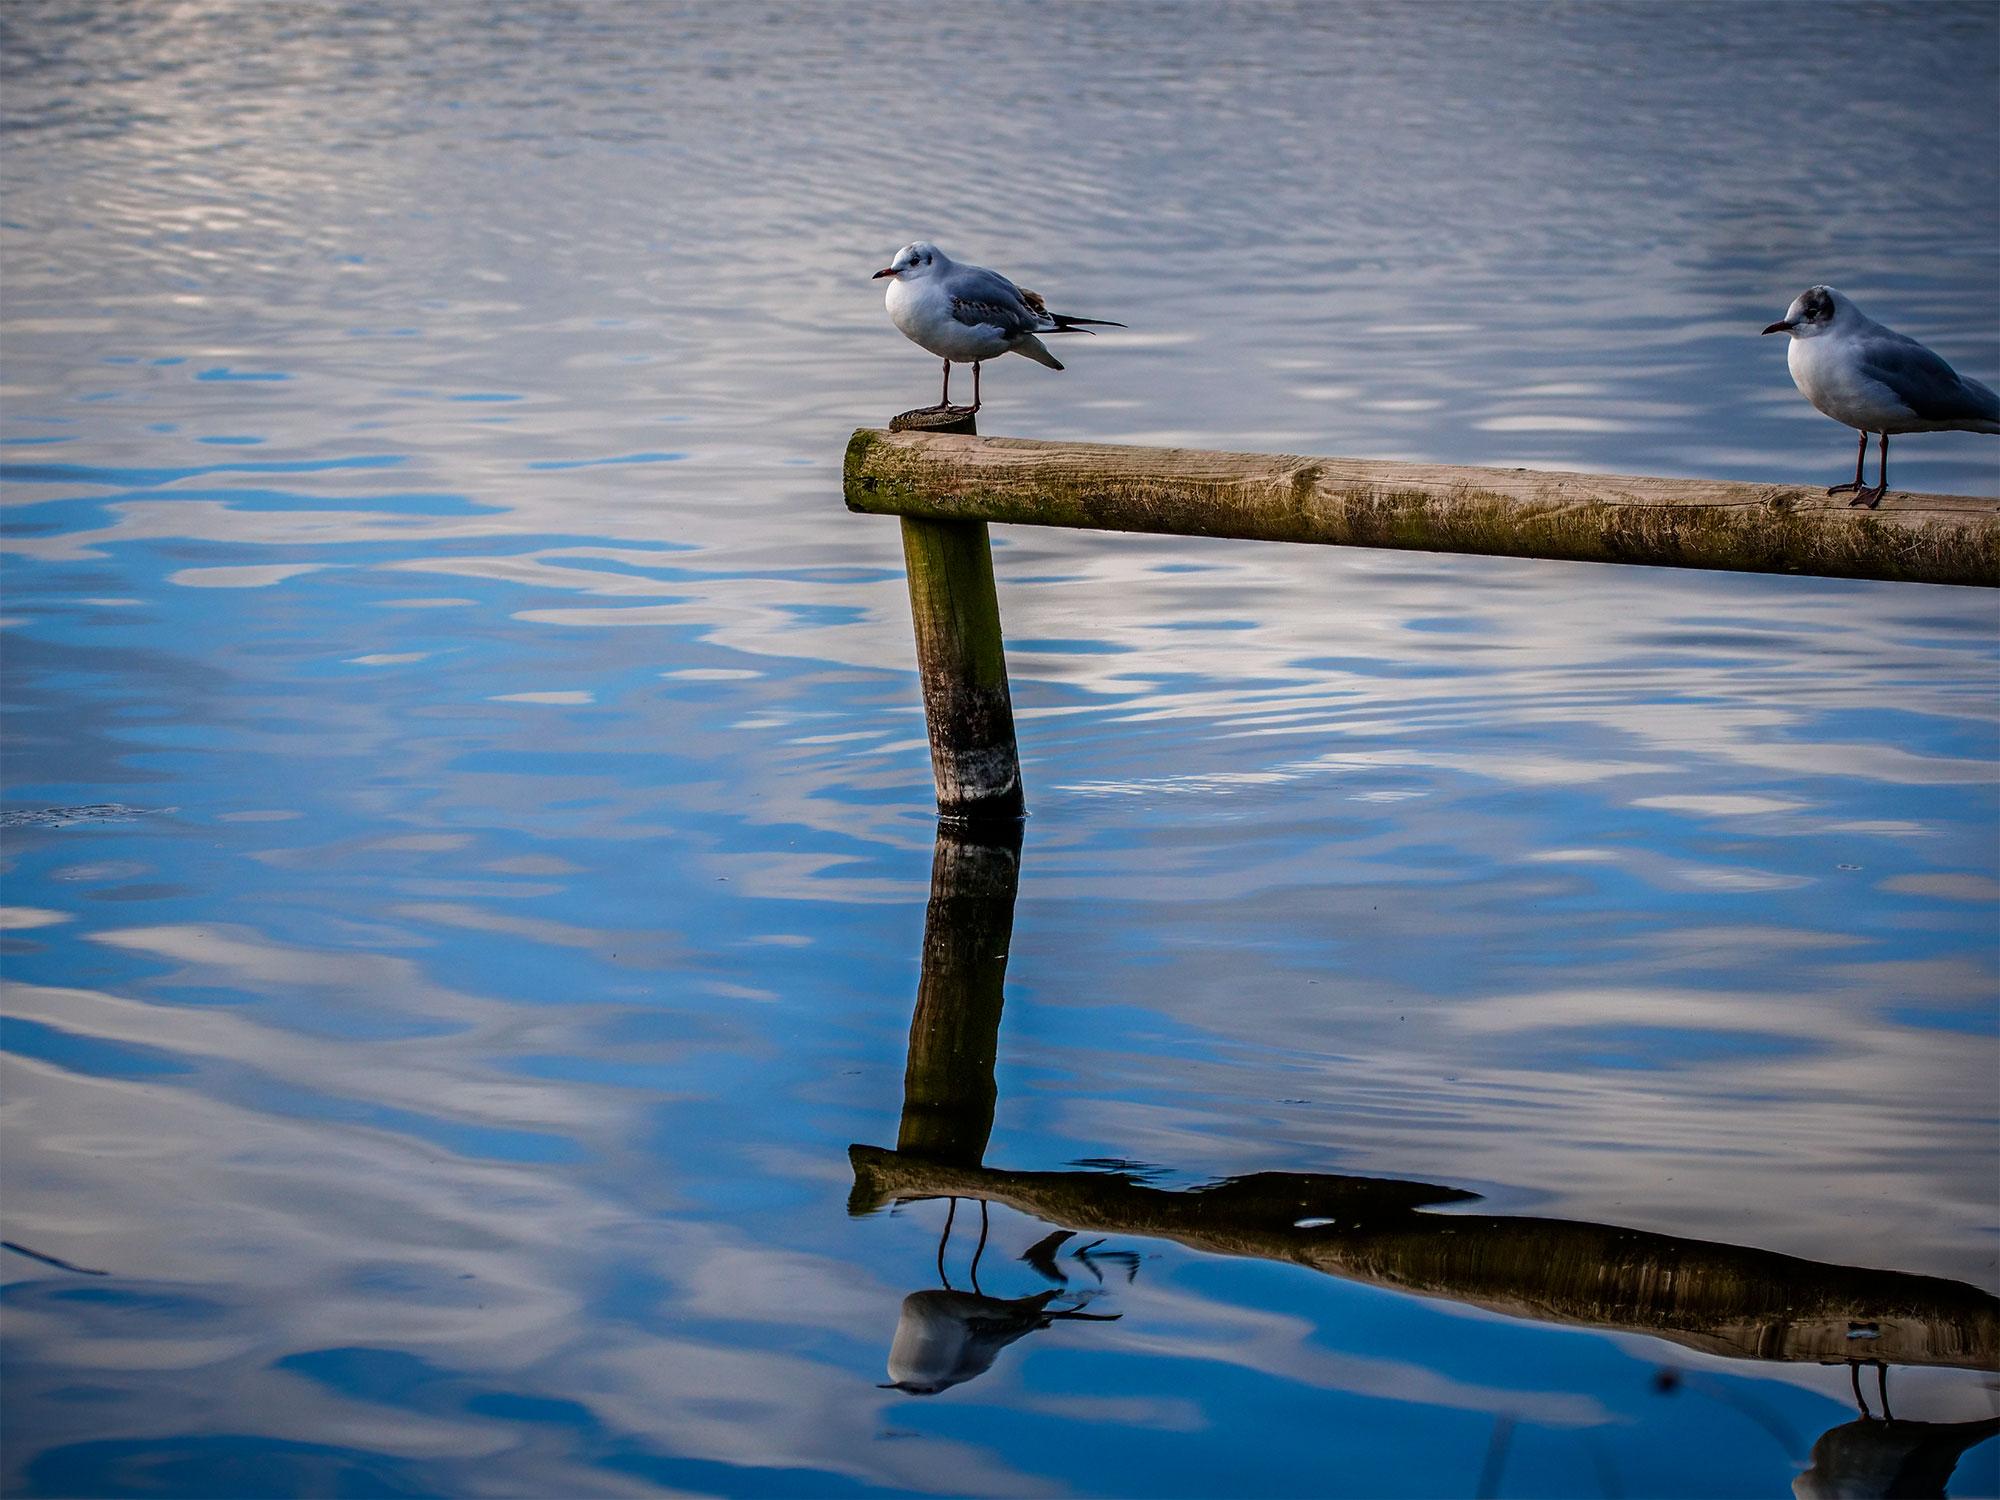 Seagull in Tatton Park, UK